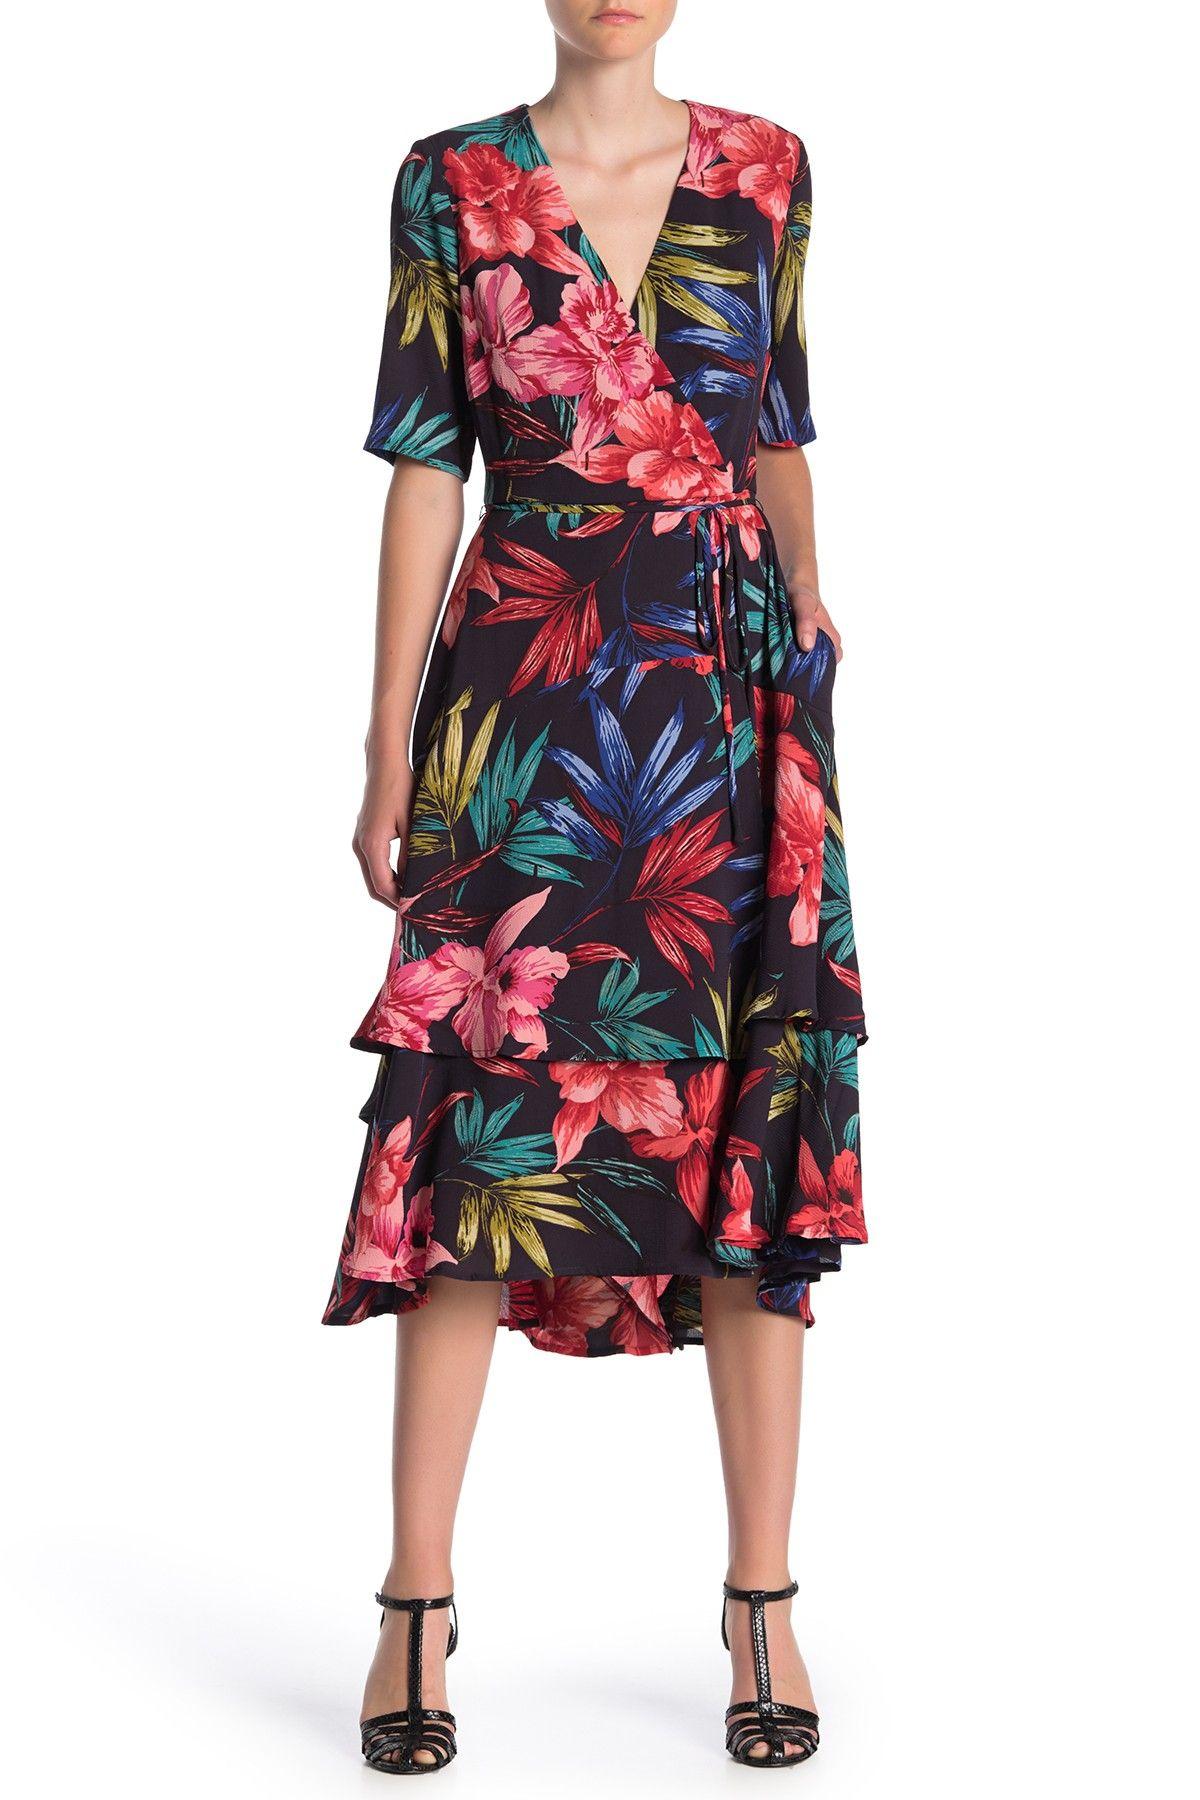 Gabby Skye | Half Sleeve Floral Midi Dress #nordstromrack